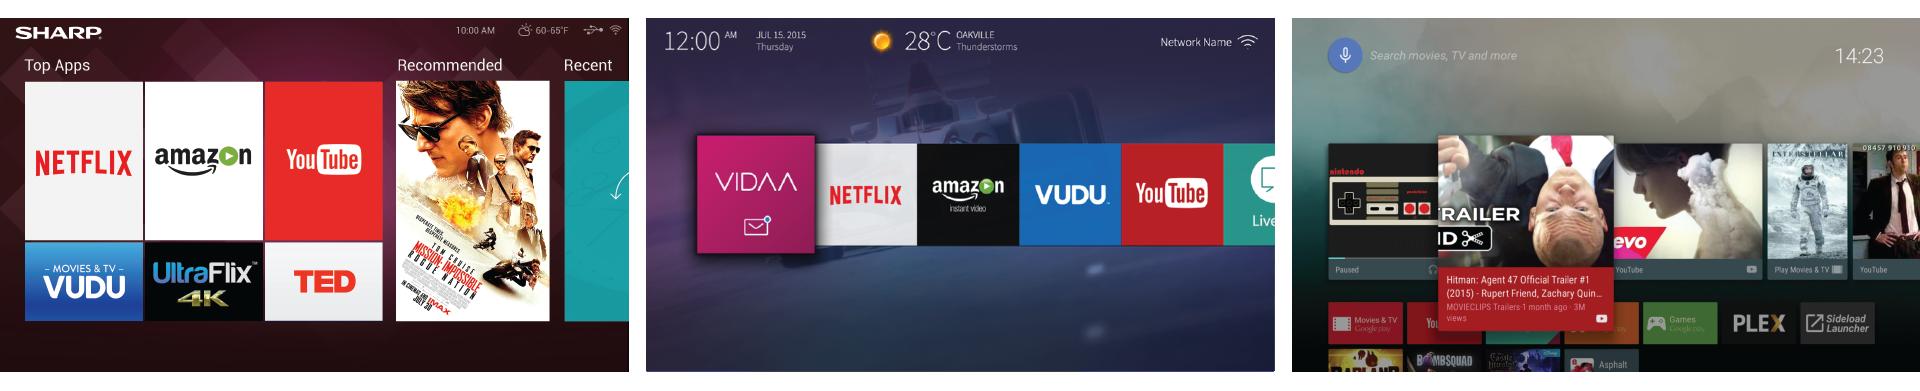 Left: Hisense-designed Sharp UI 2016, Hisense VIDAA U2 (expected H2 2016), Android TV